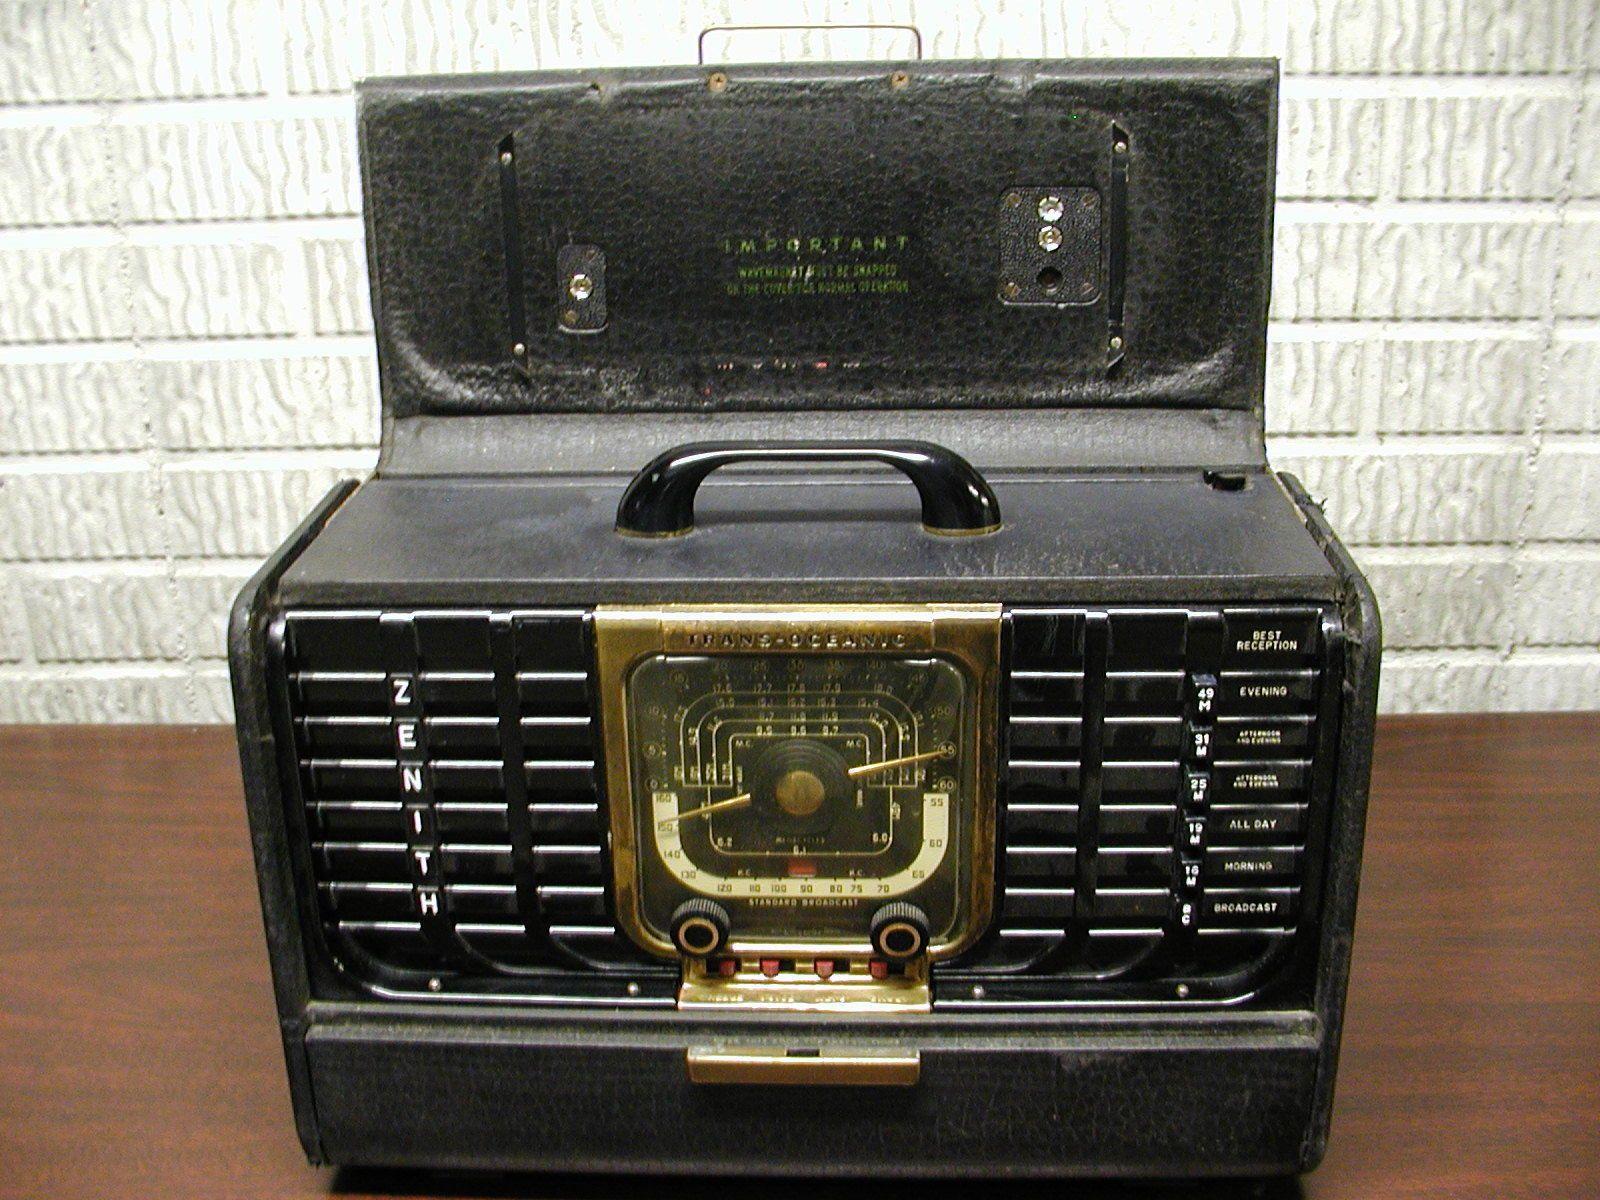 Zenith Transoceanic Radio Model 8g005ytz1 Parts Or Restore Radio Restoration Zenith